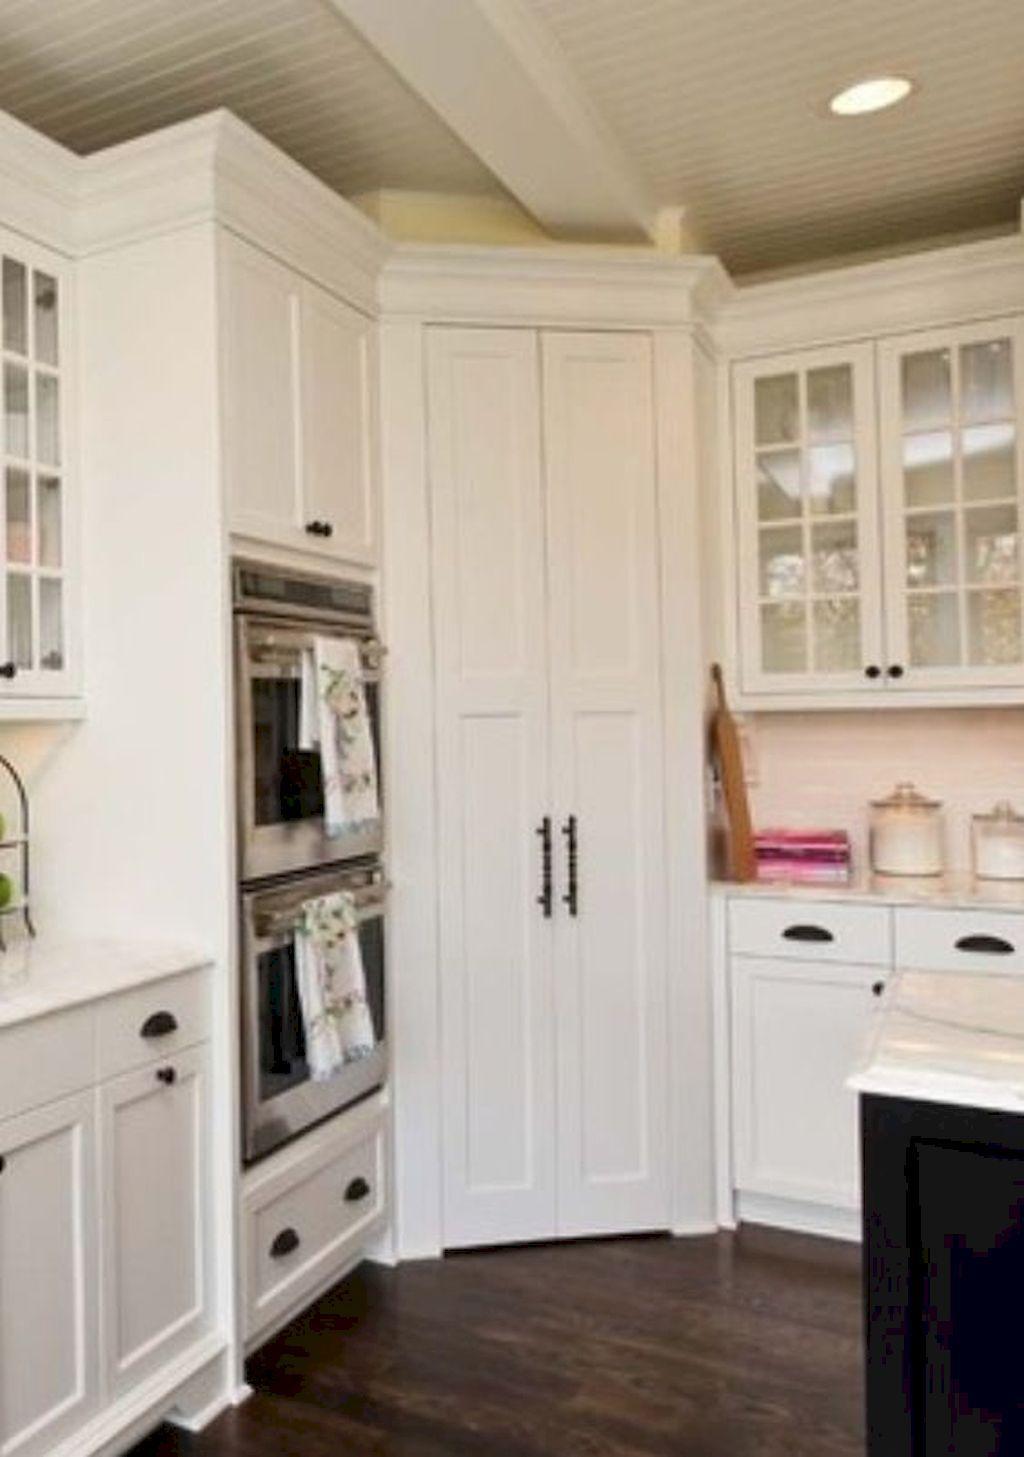 Wondrous Kitchen Pantry Ideas That Will Improve Your Kitchen Renovation Value Pantry Layout Corner Pantry Cabinet Kitchen Layout